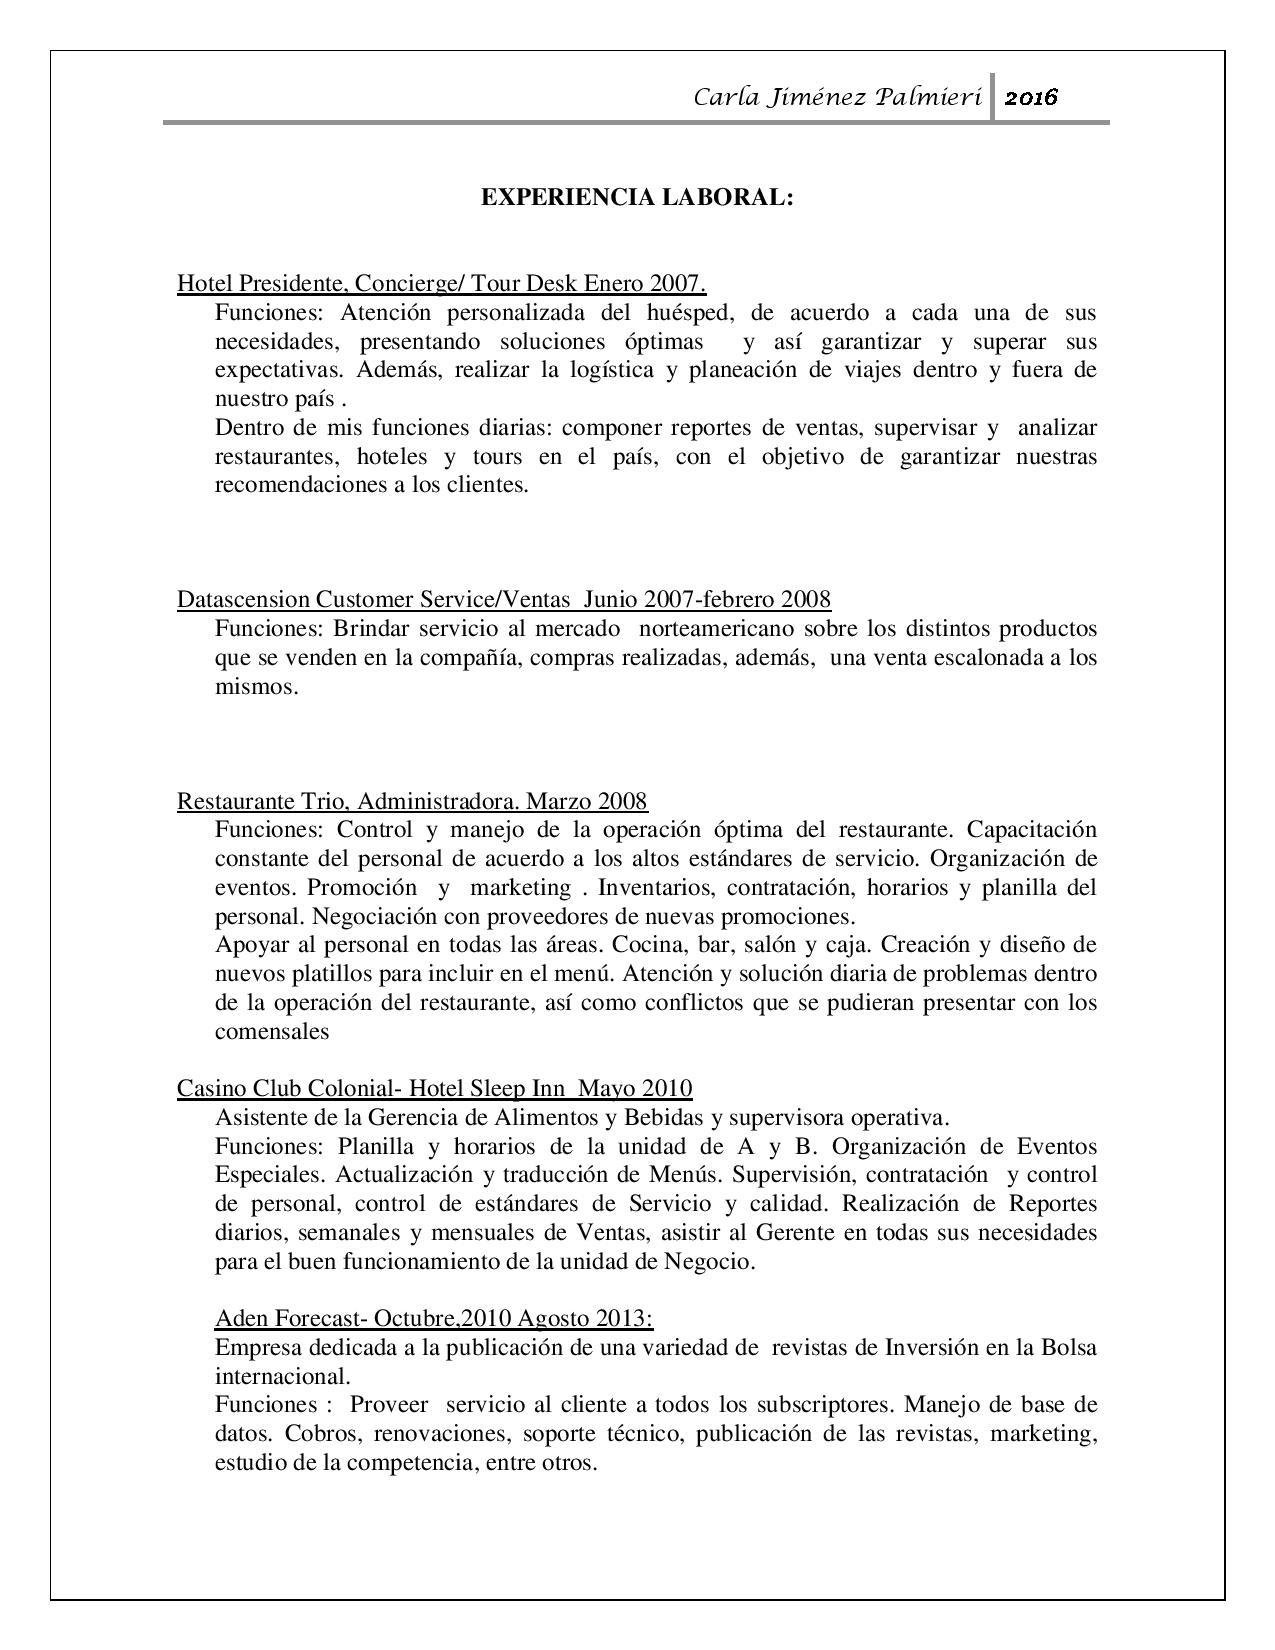 Carla Jimenez CV- Posted Nov 30